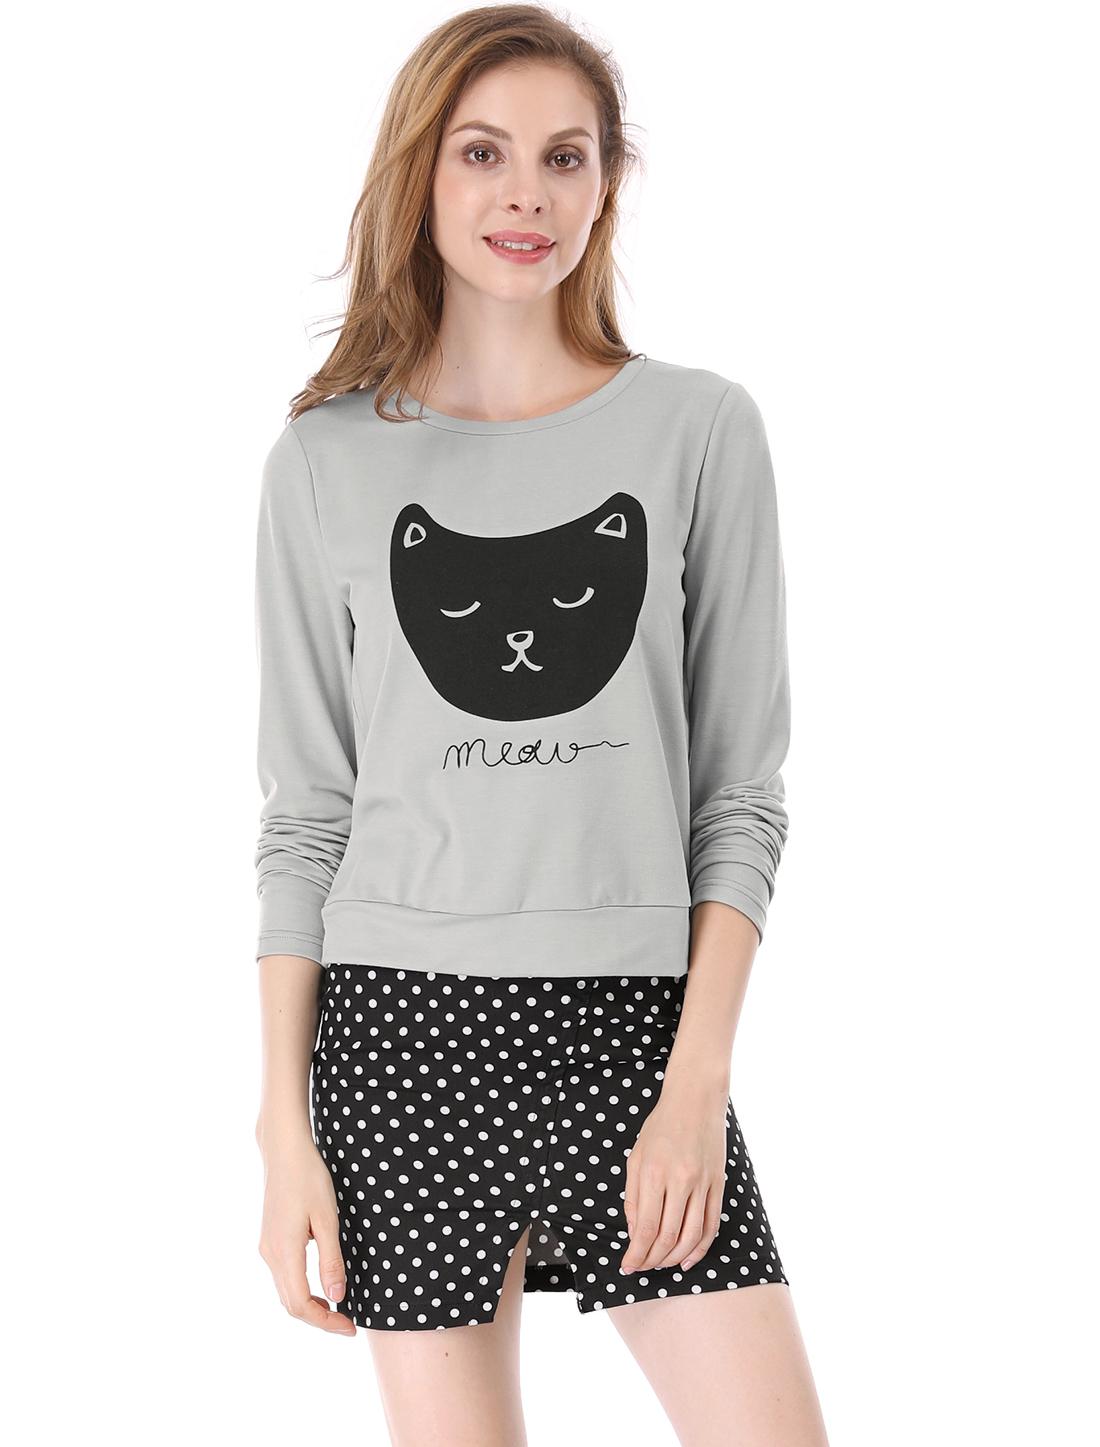 Allegra K Women Cat Prints Round Neck Long Sleeves Top Shirt Gray L